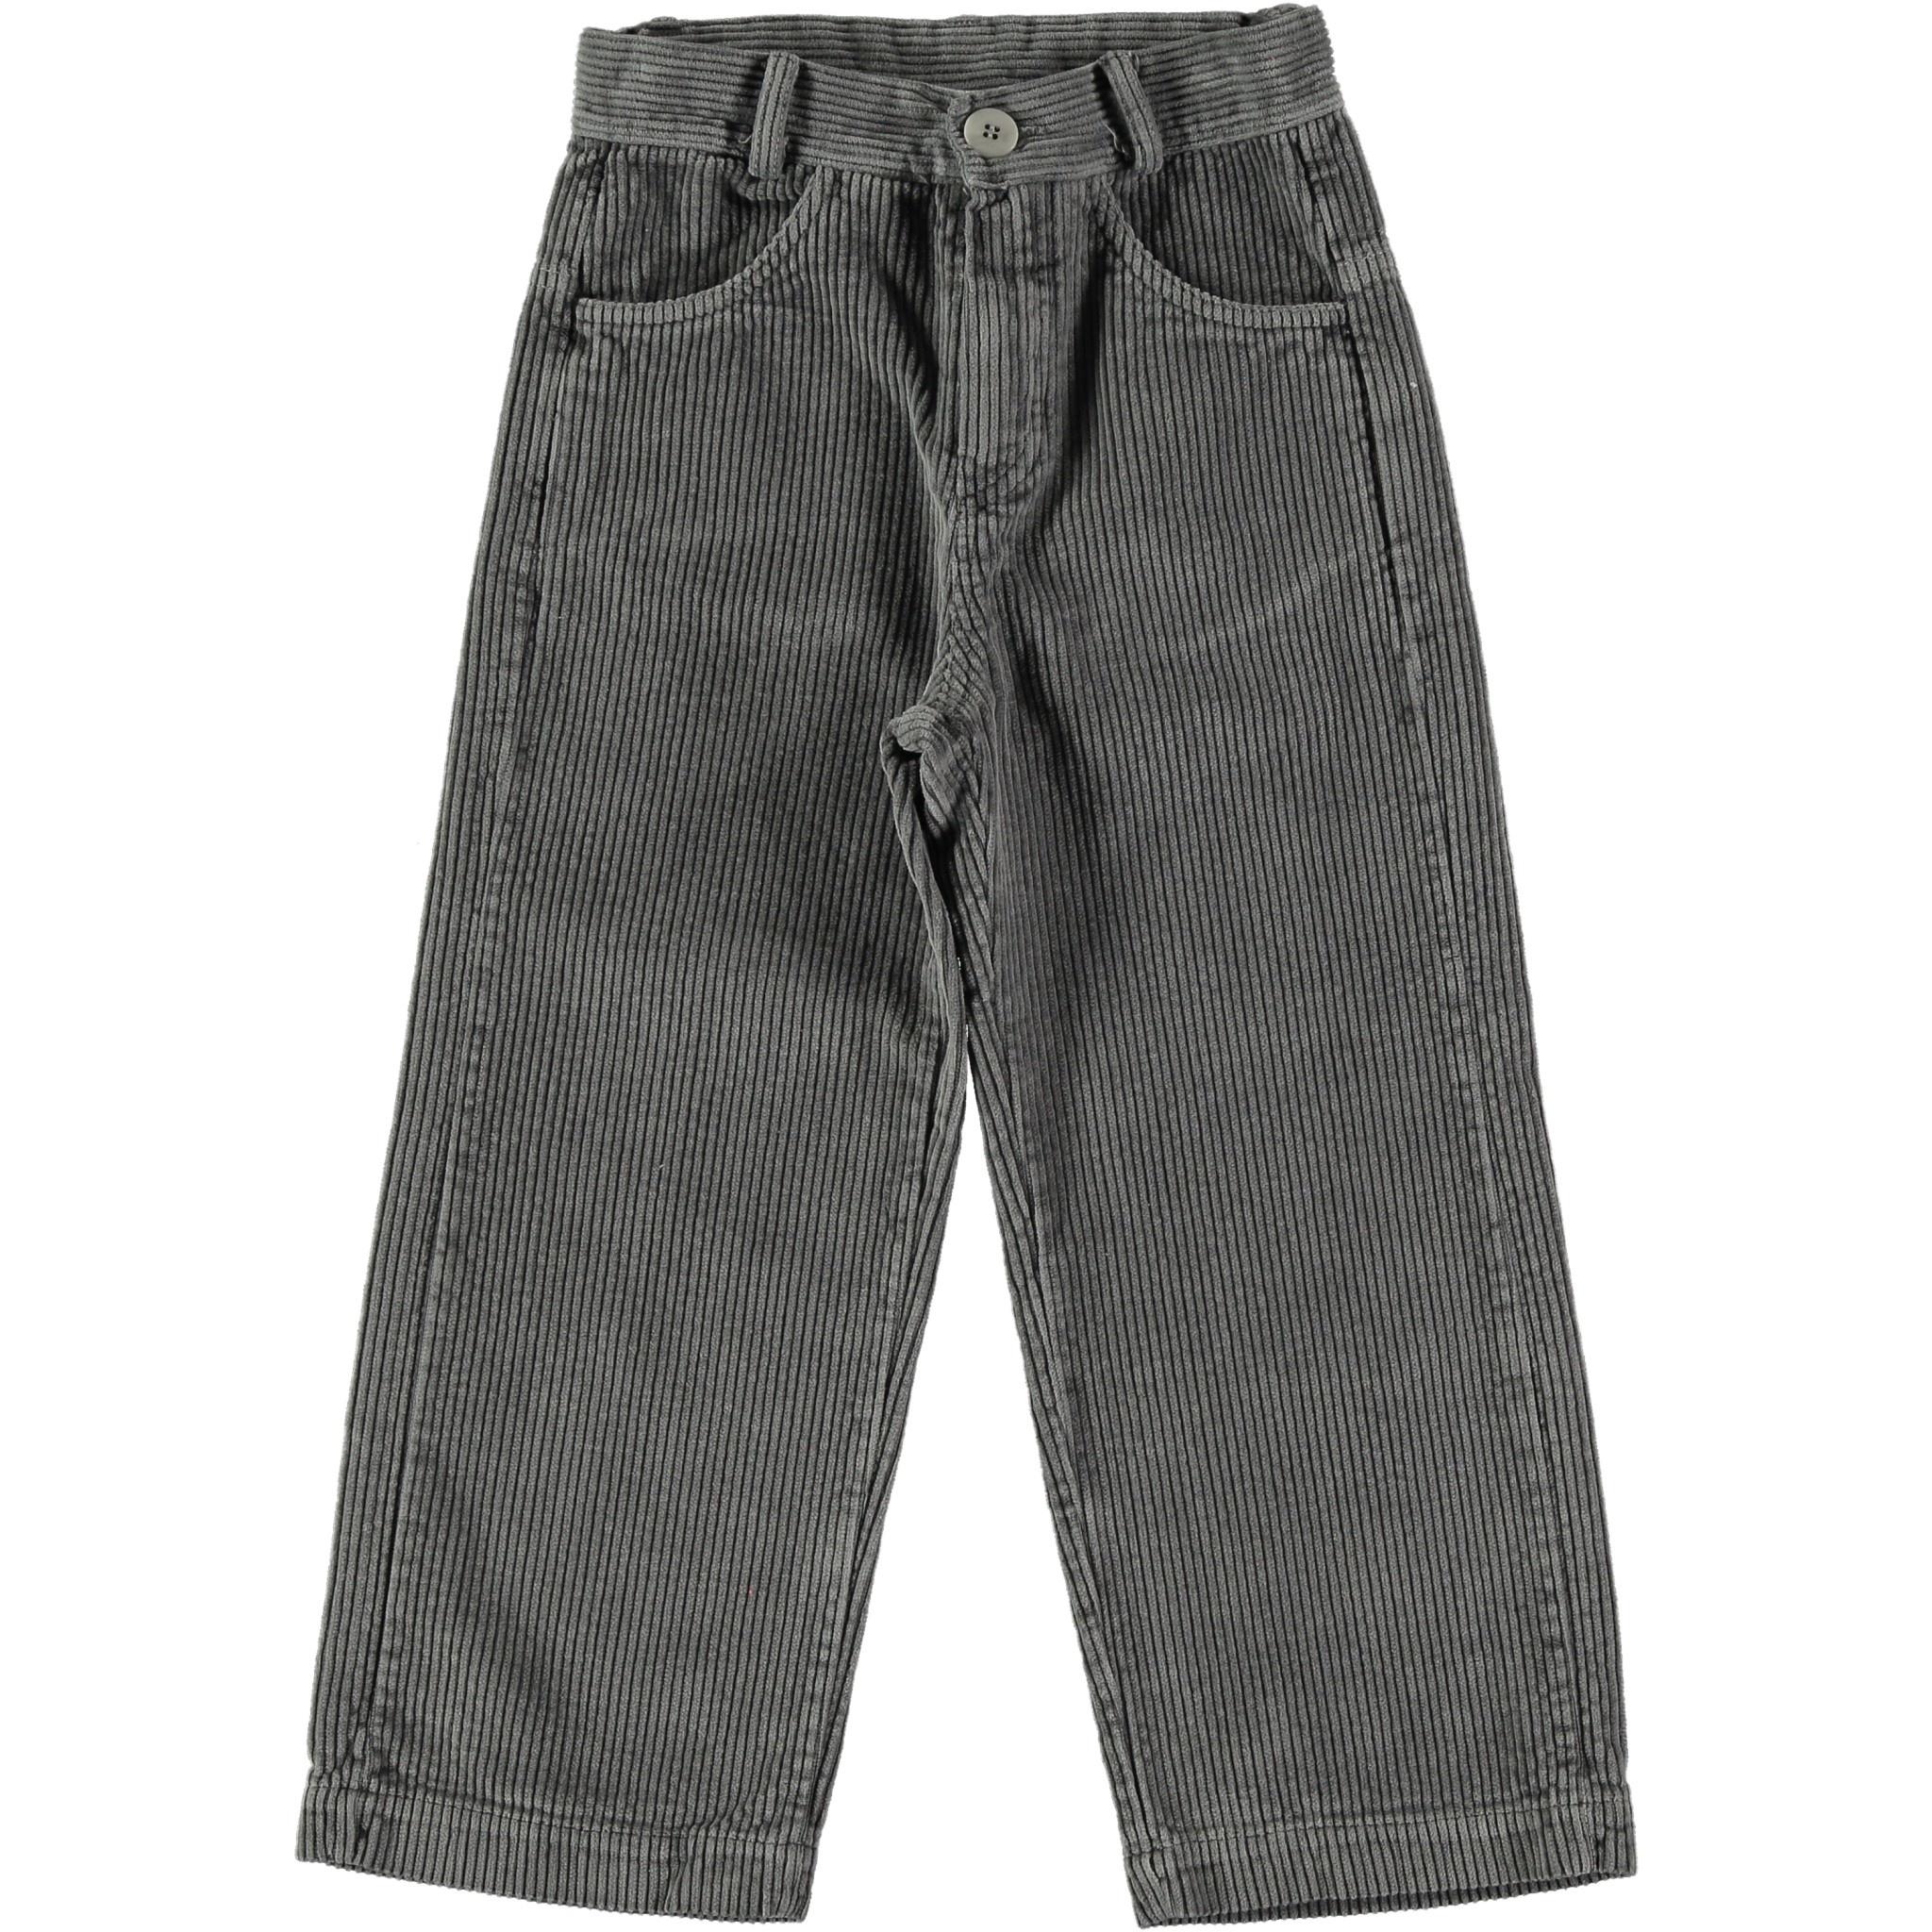 Corduroy trouser everyday good night-1